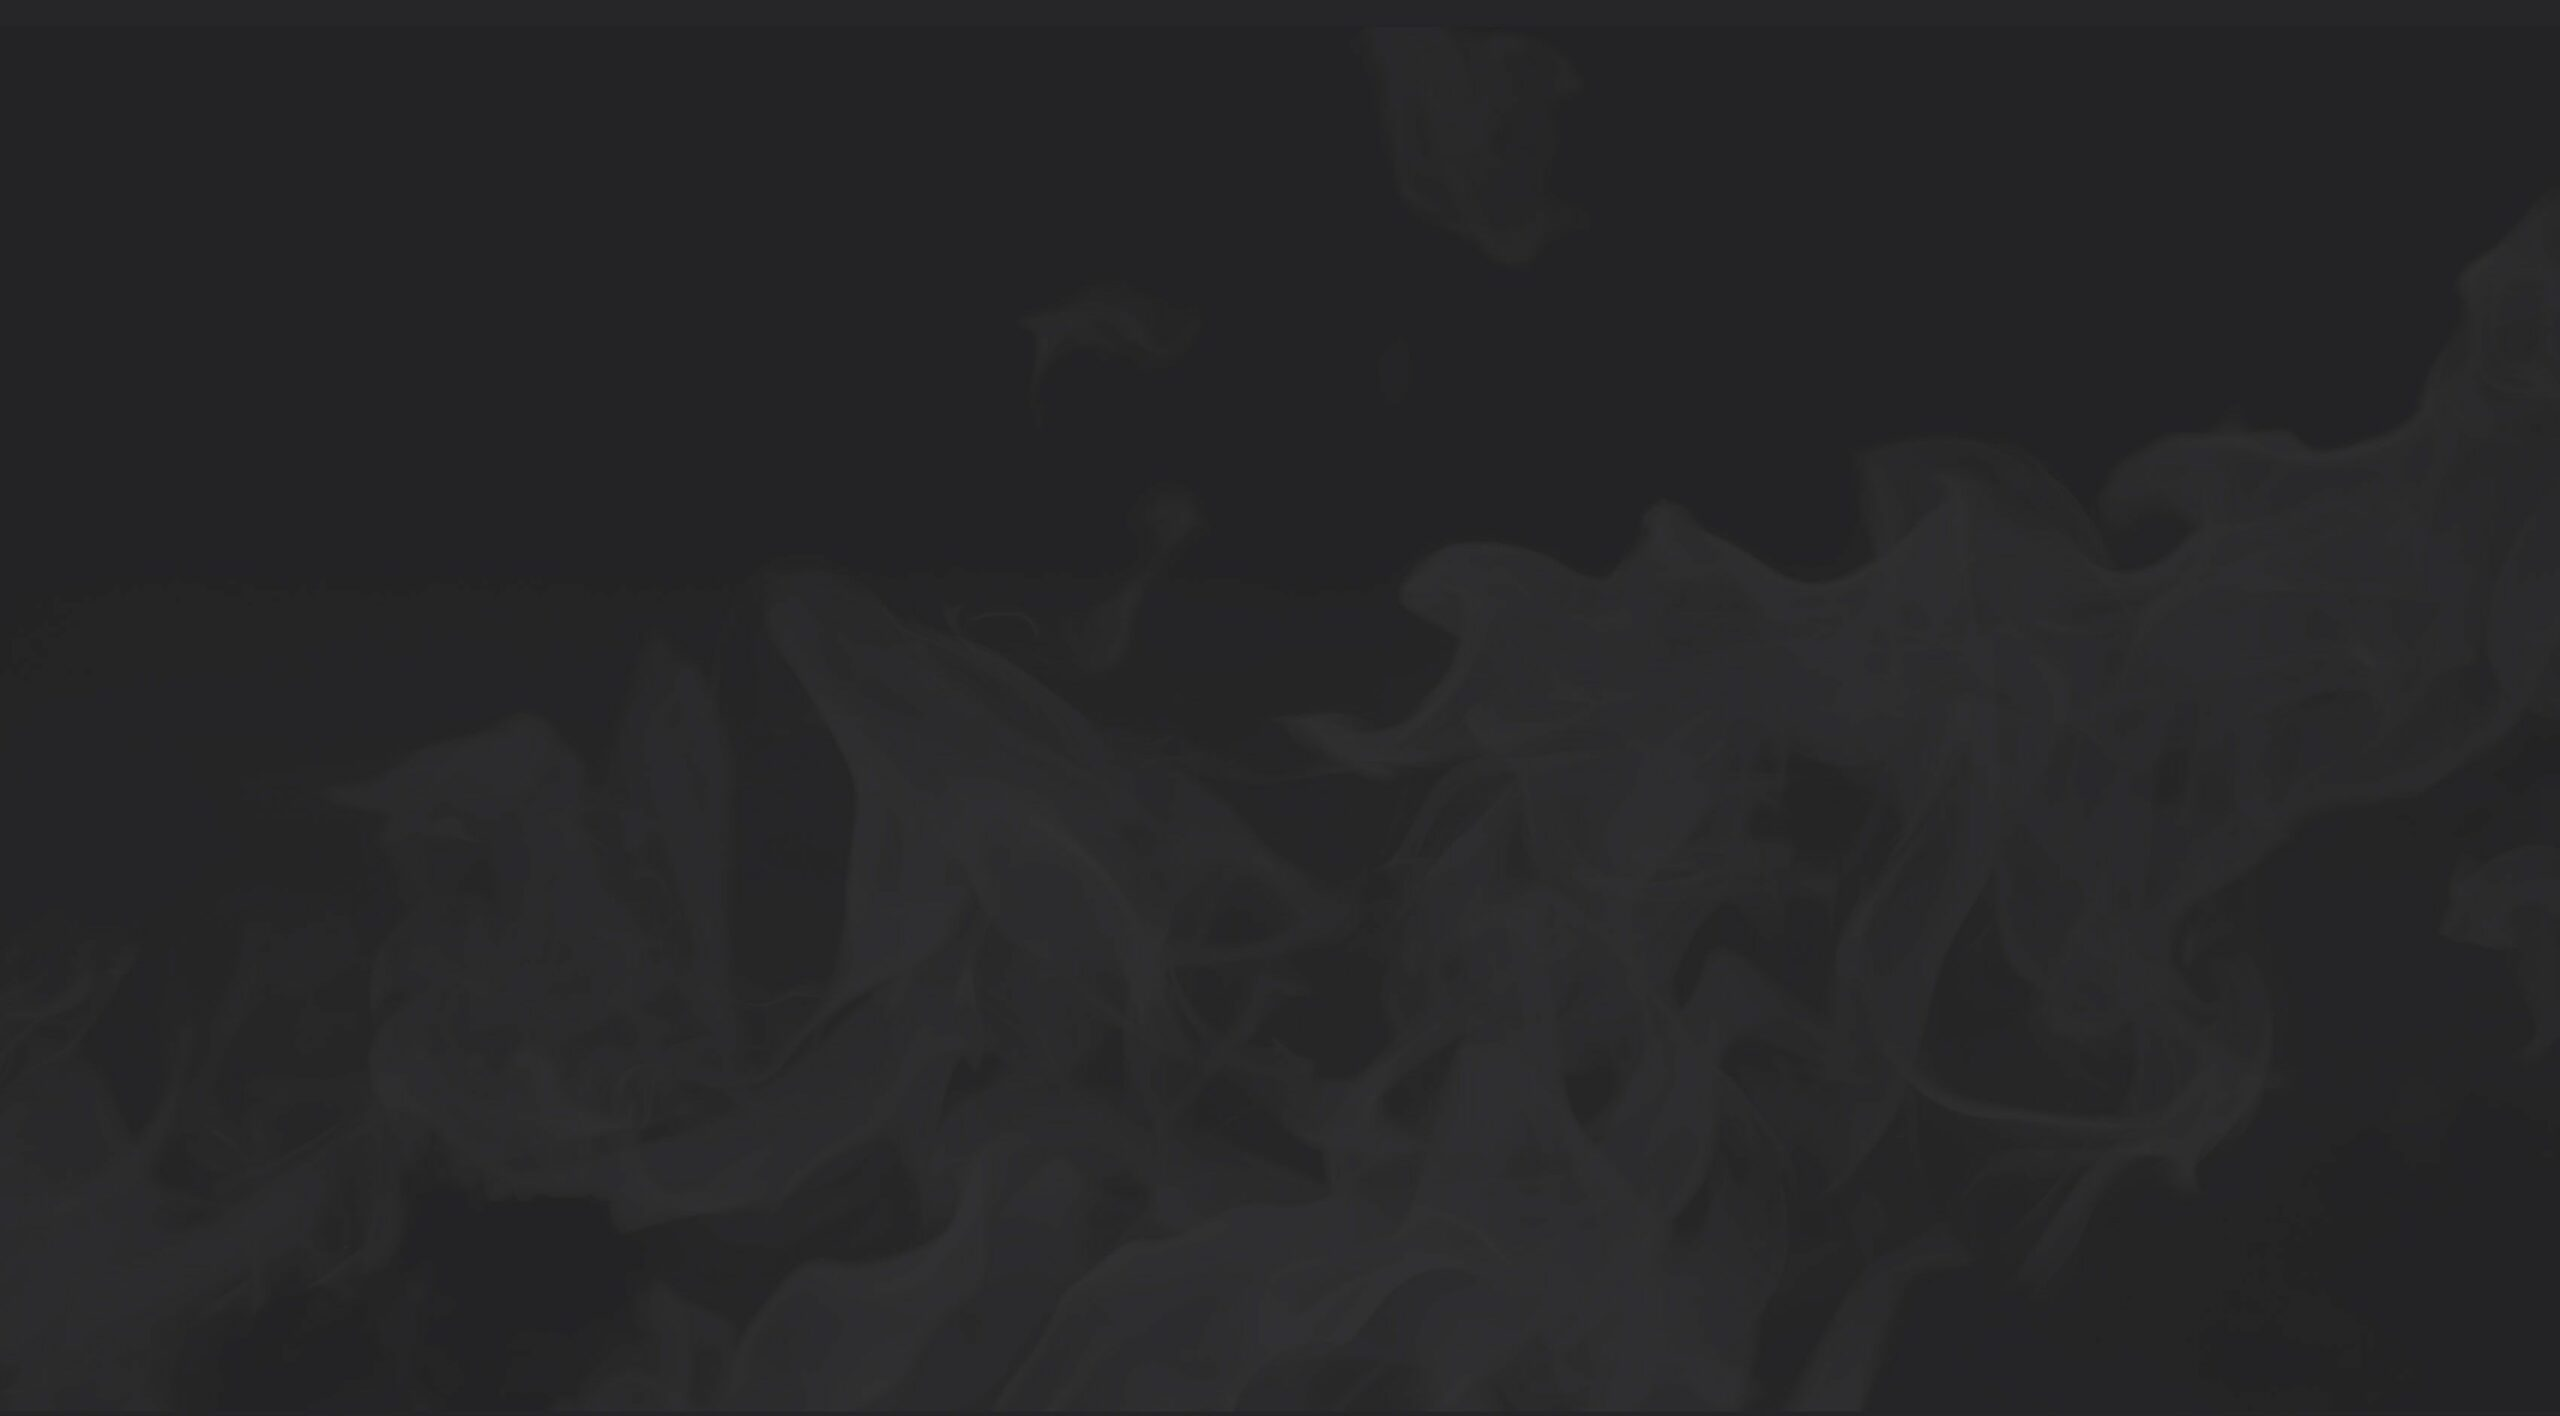 livestream-block-background